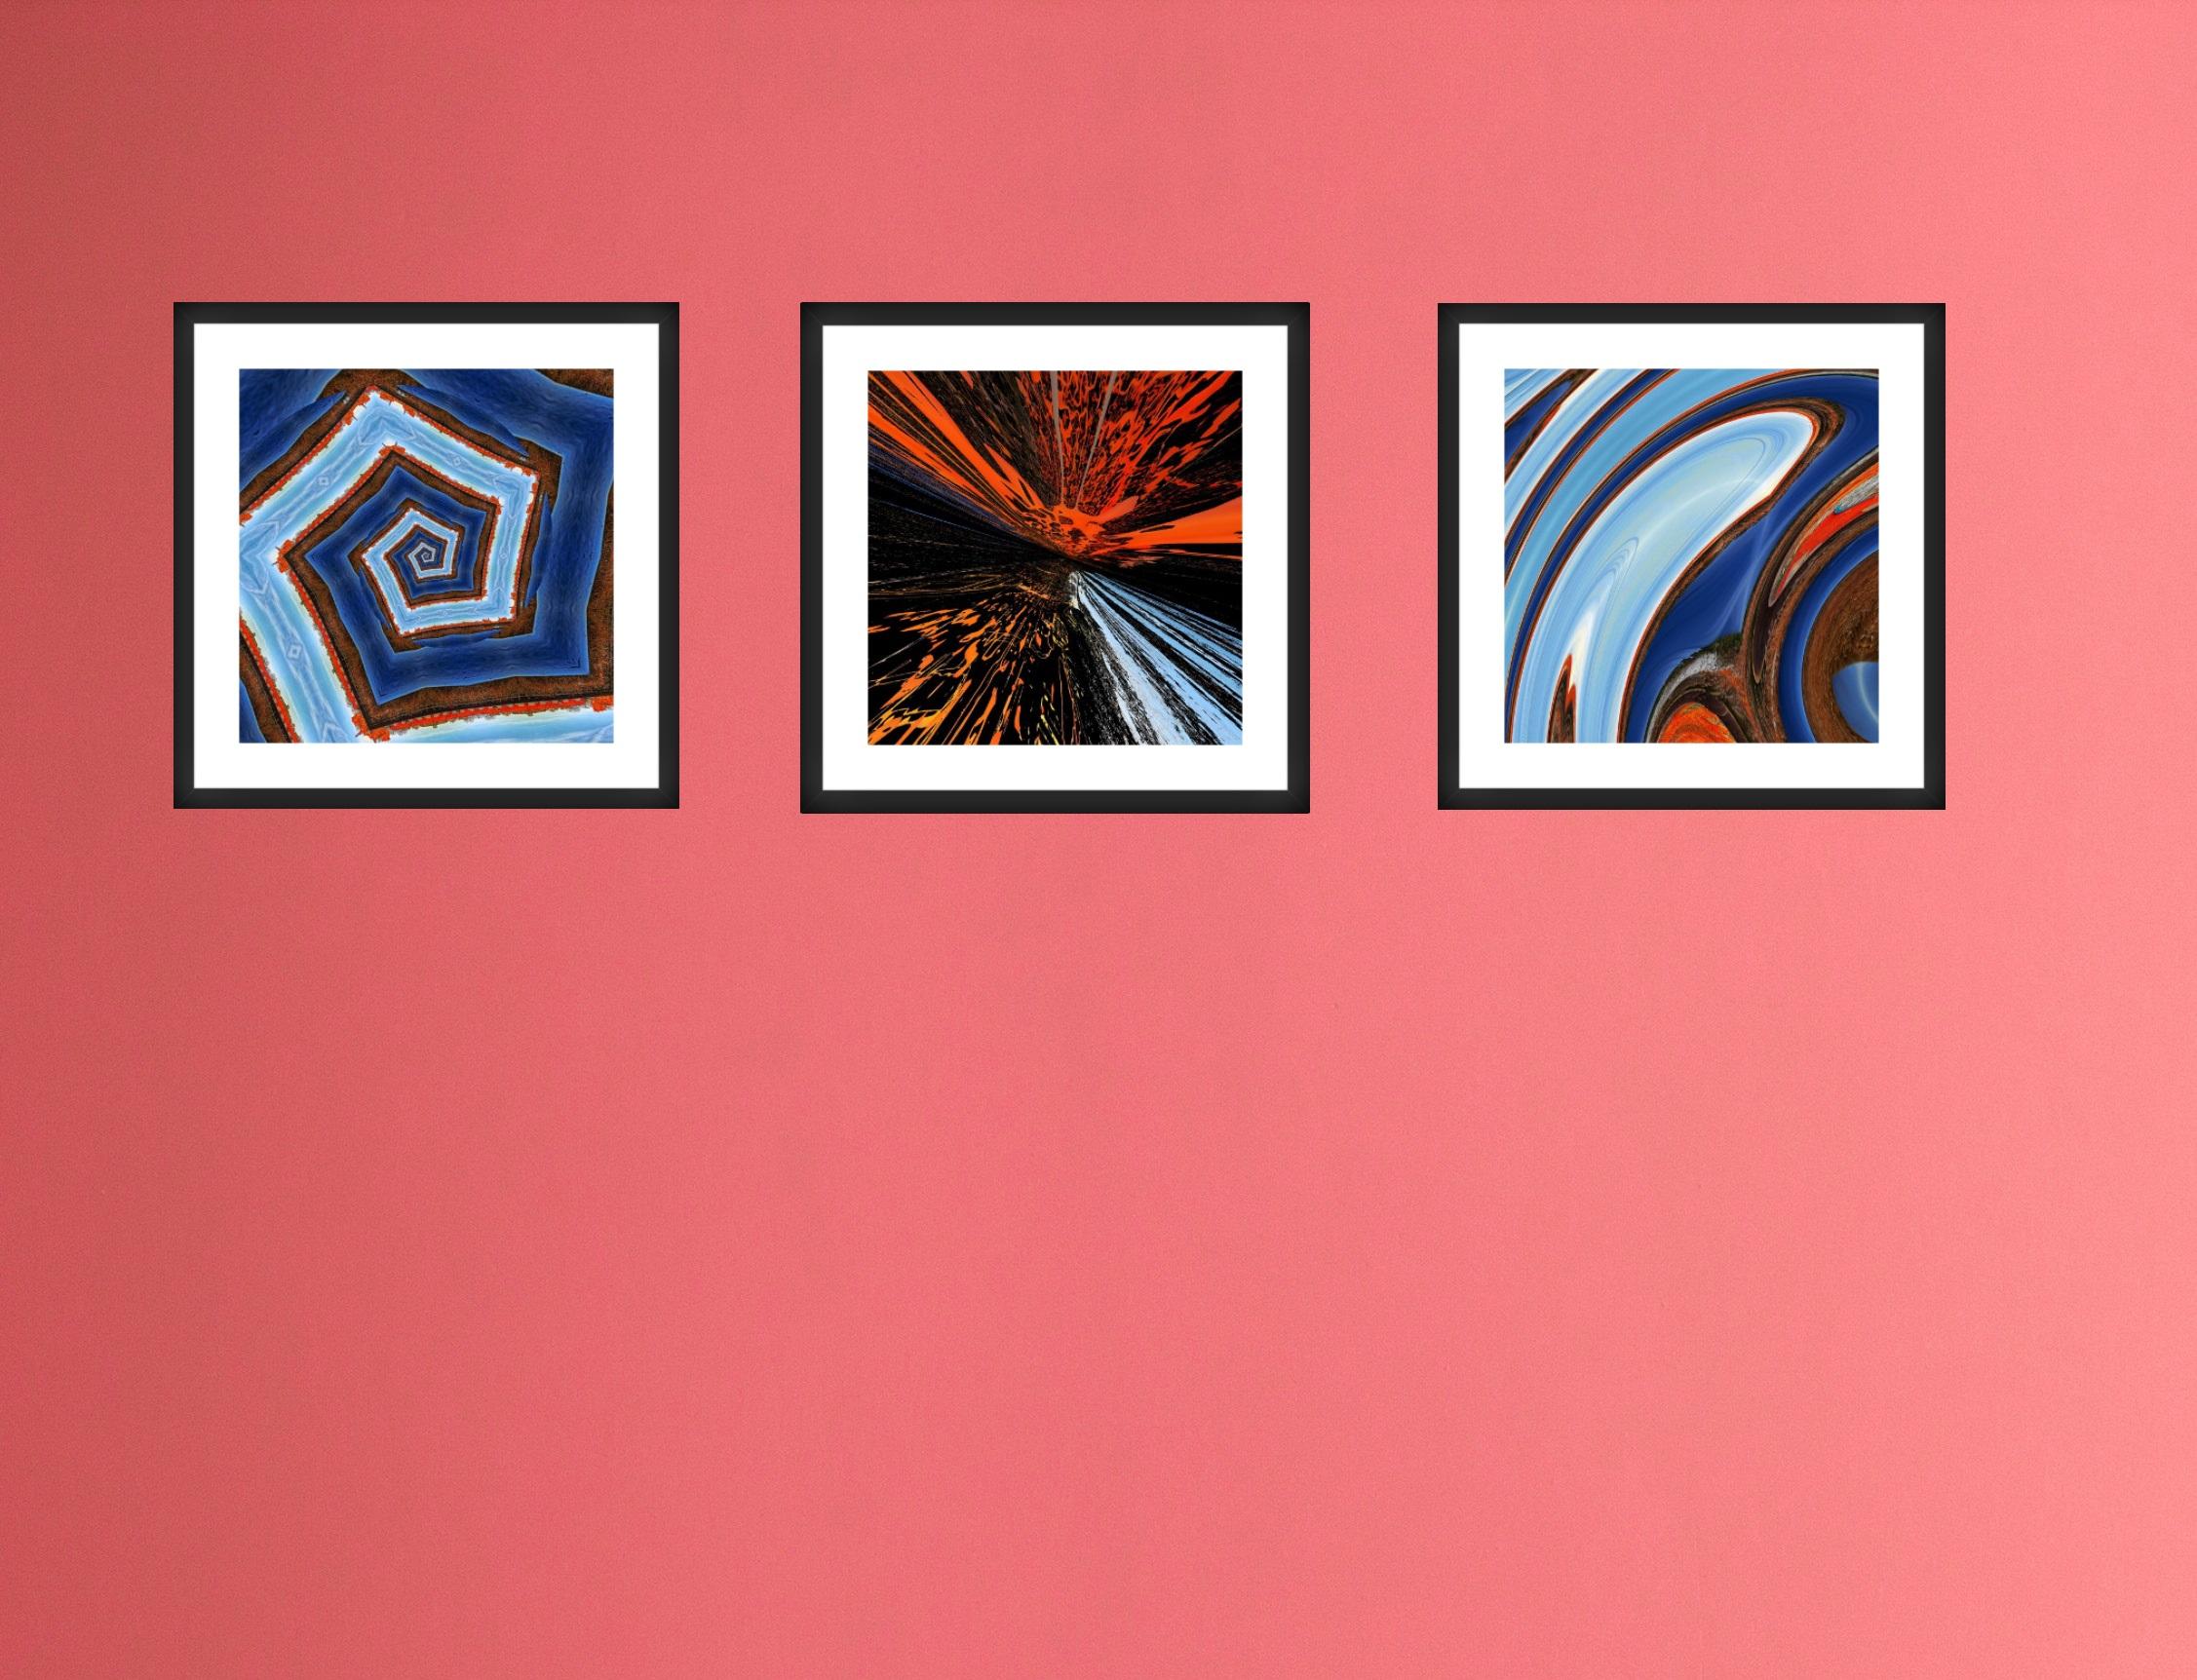 art-artistic-bright-2065650 6.jpg